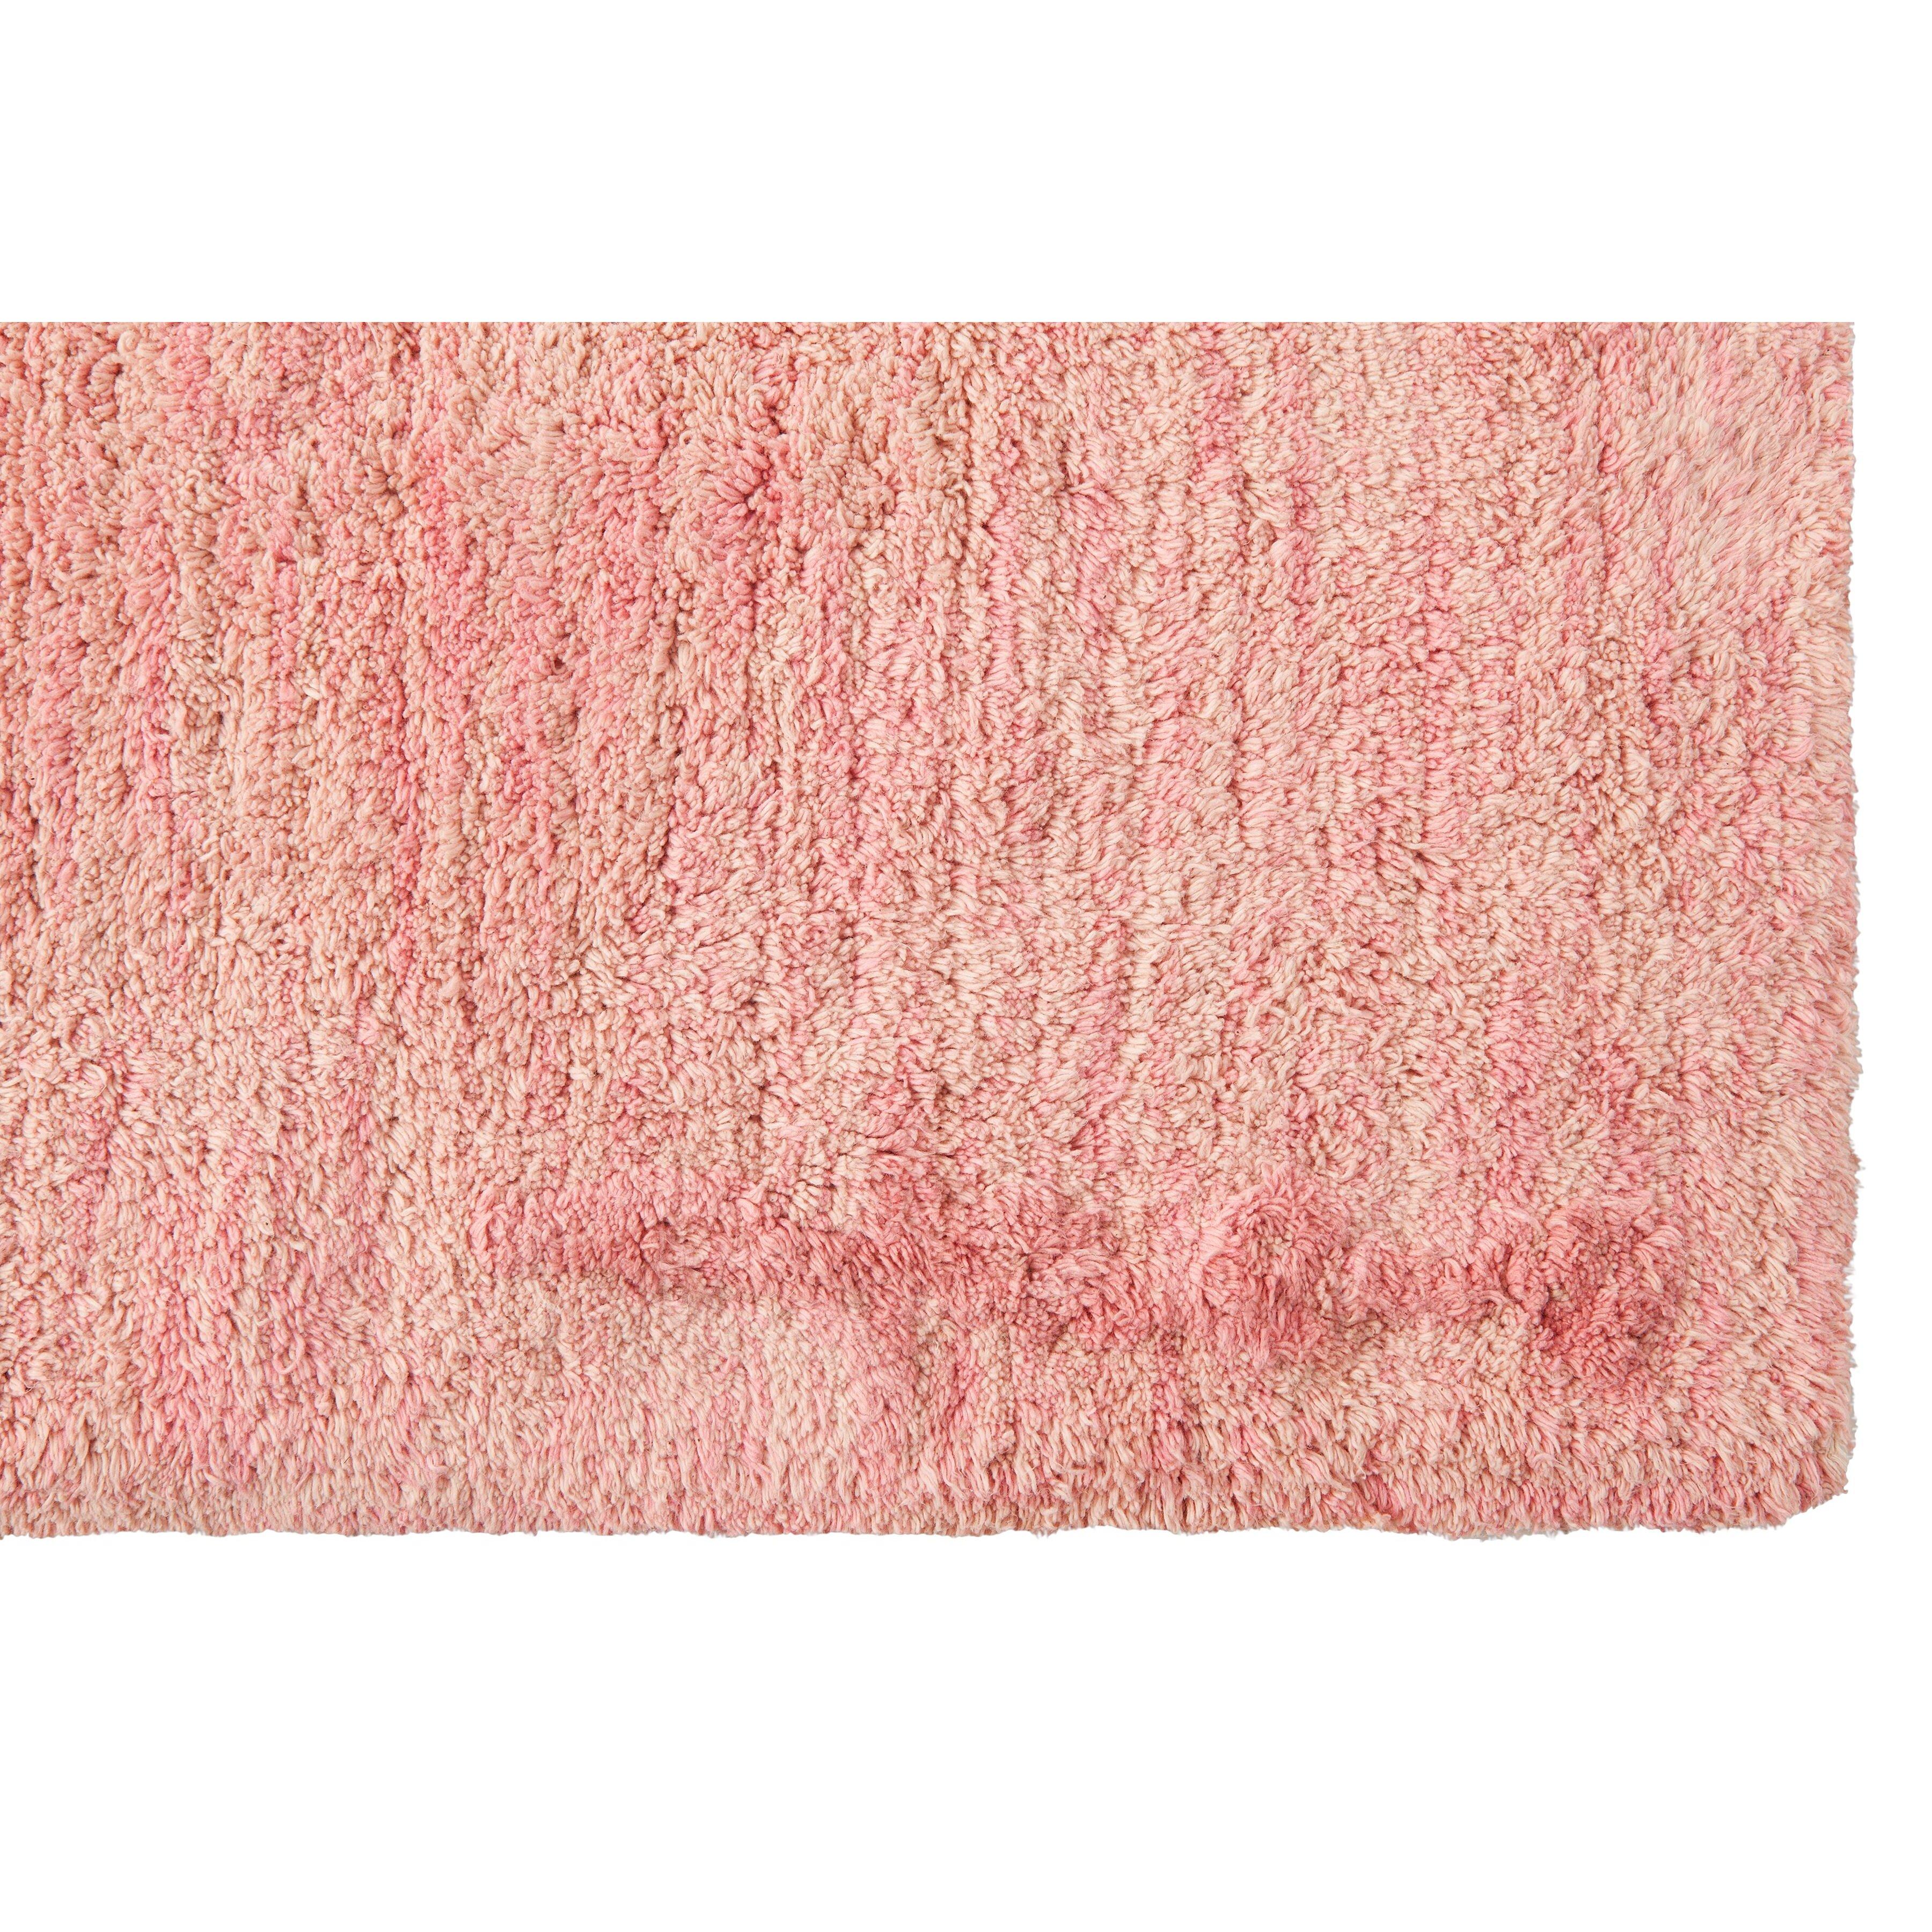 handgefertigter teppich aarty in rosa von lorena canals. Black Bedroom Furniture Sets. Home Design Ideas